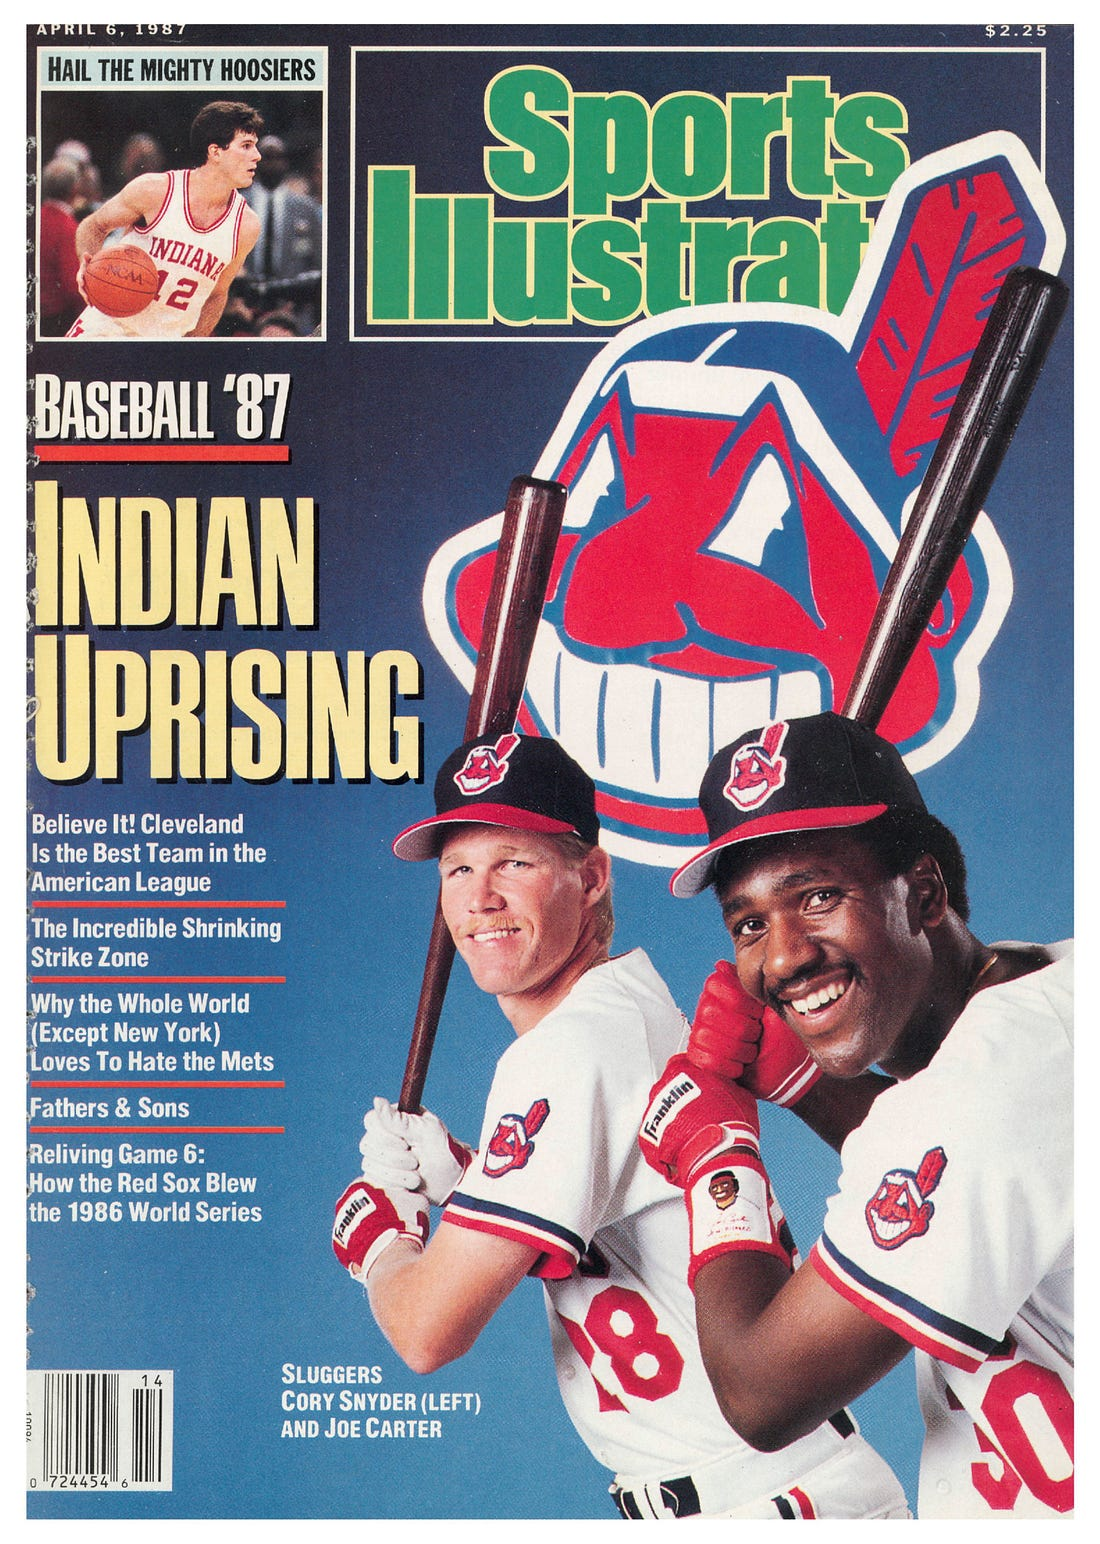 Sports_Illustrated_702422_19870406-001-2048.jpg